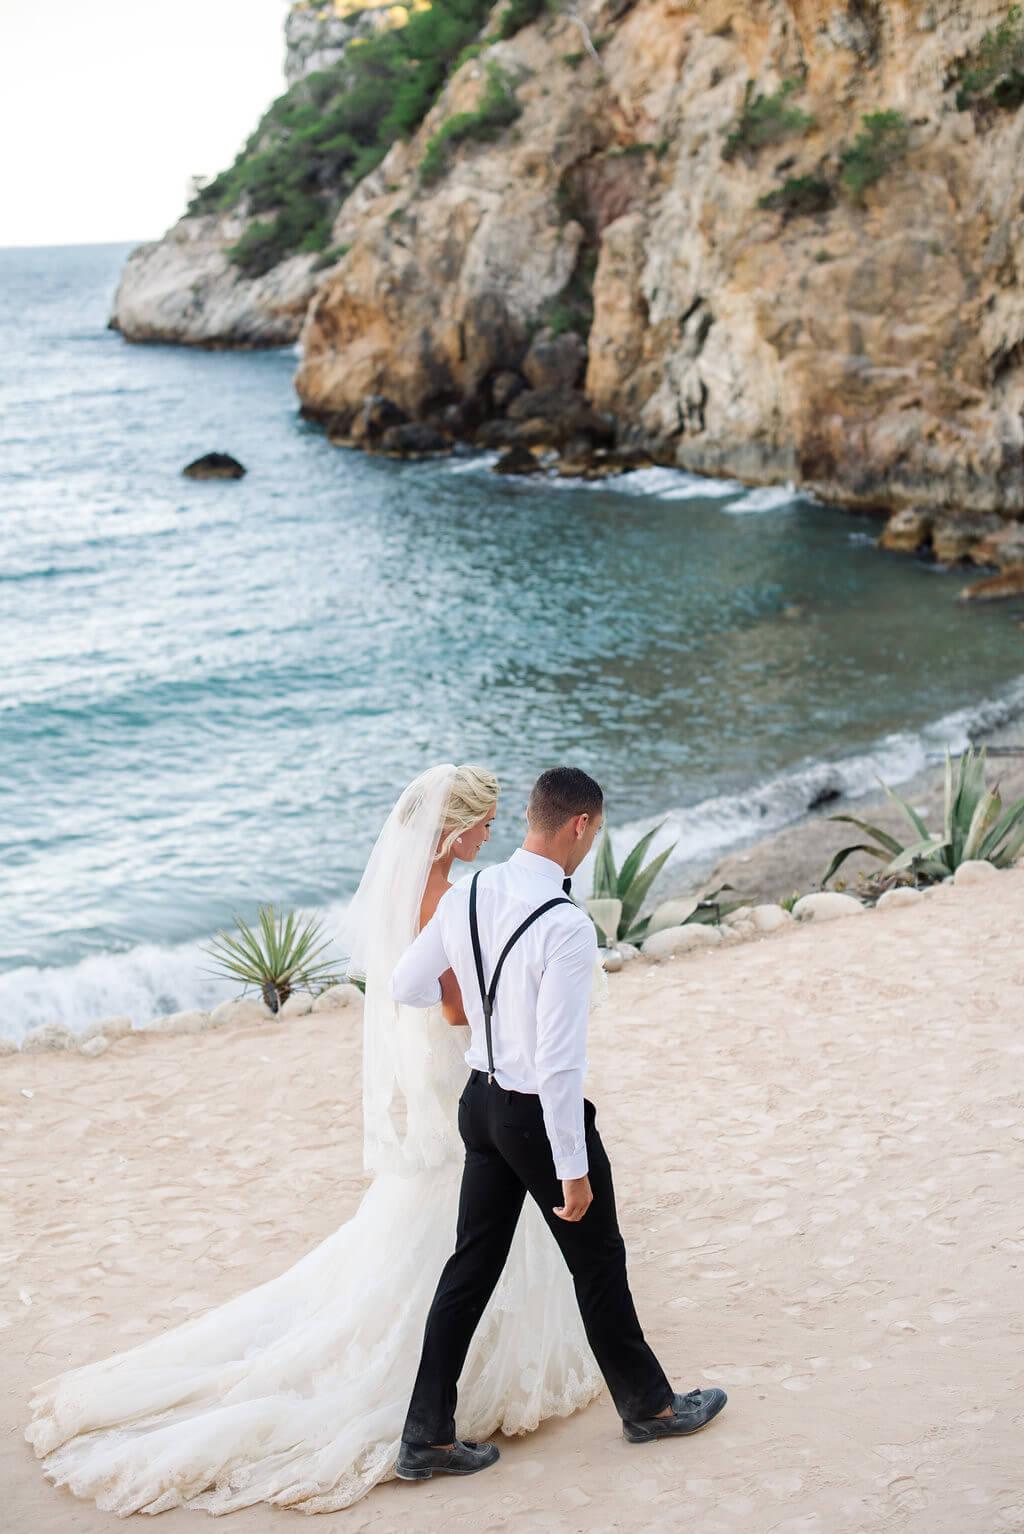 https://www.white-ibiza.com/wp-content/uploads/2020/03/ibiza-wedding-venues-amante-ibiza-2020-10.jpg